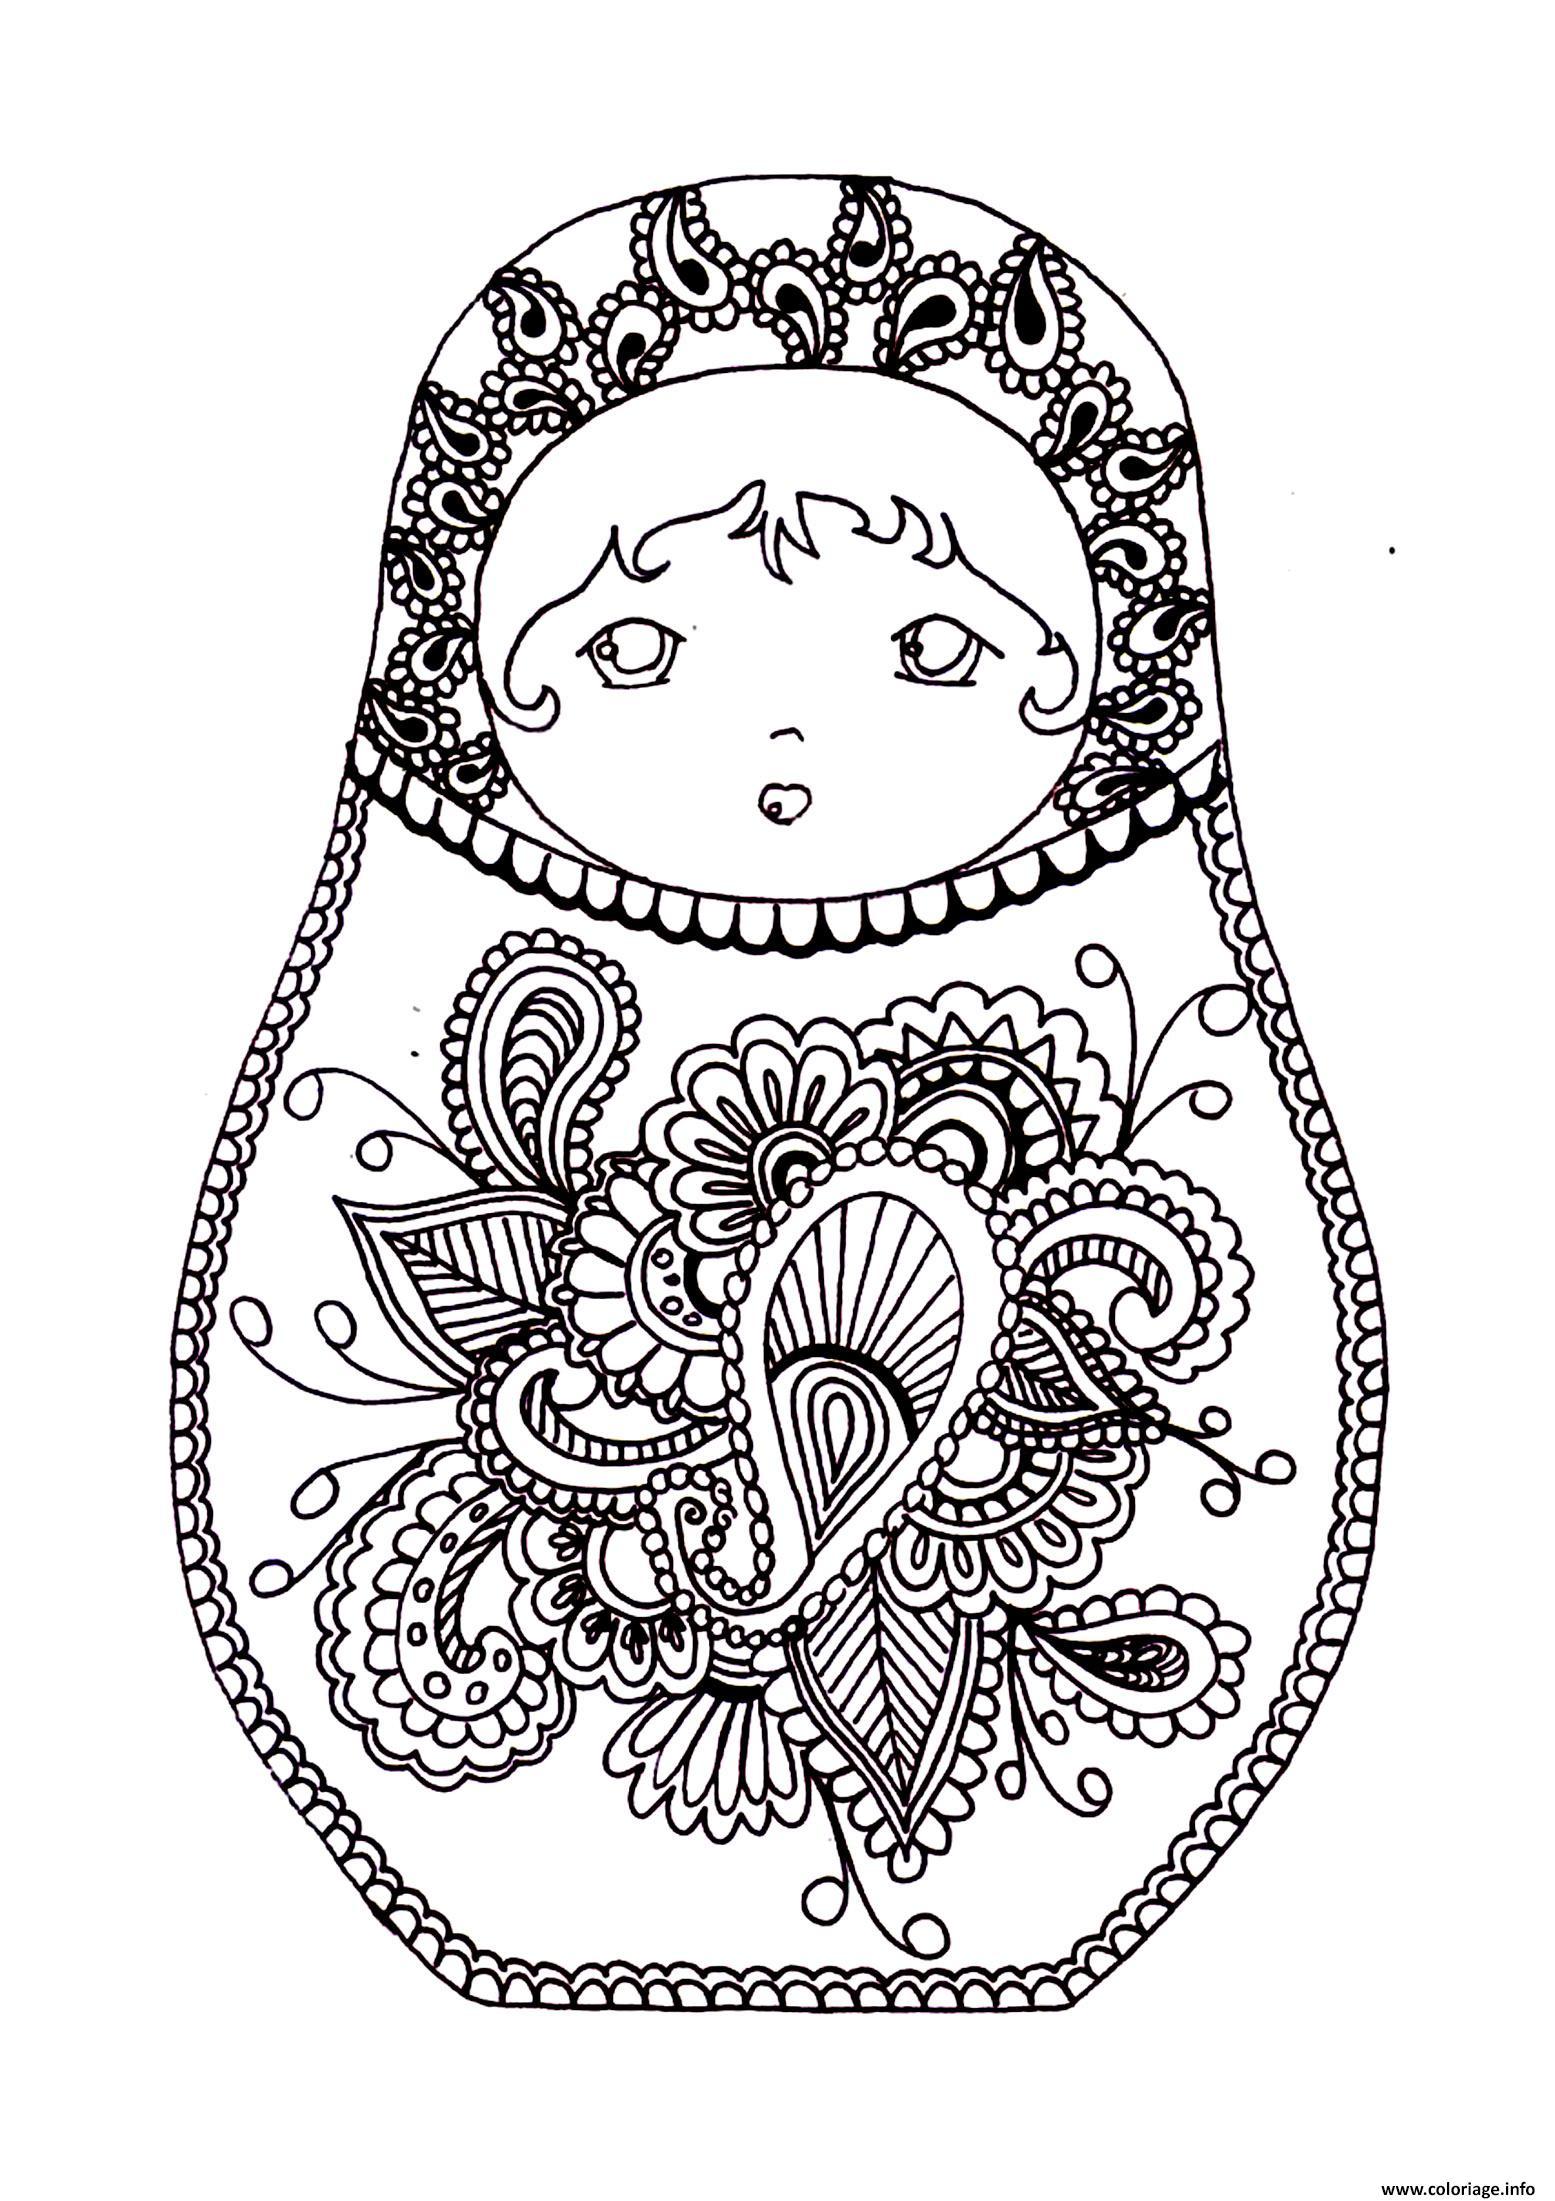 Coloriage Matryoshka Dolls Original Poupee Russe Dessin ...